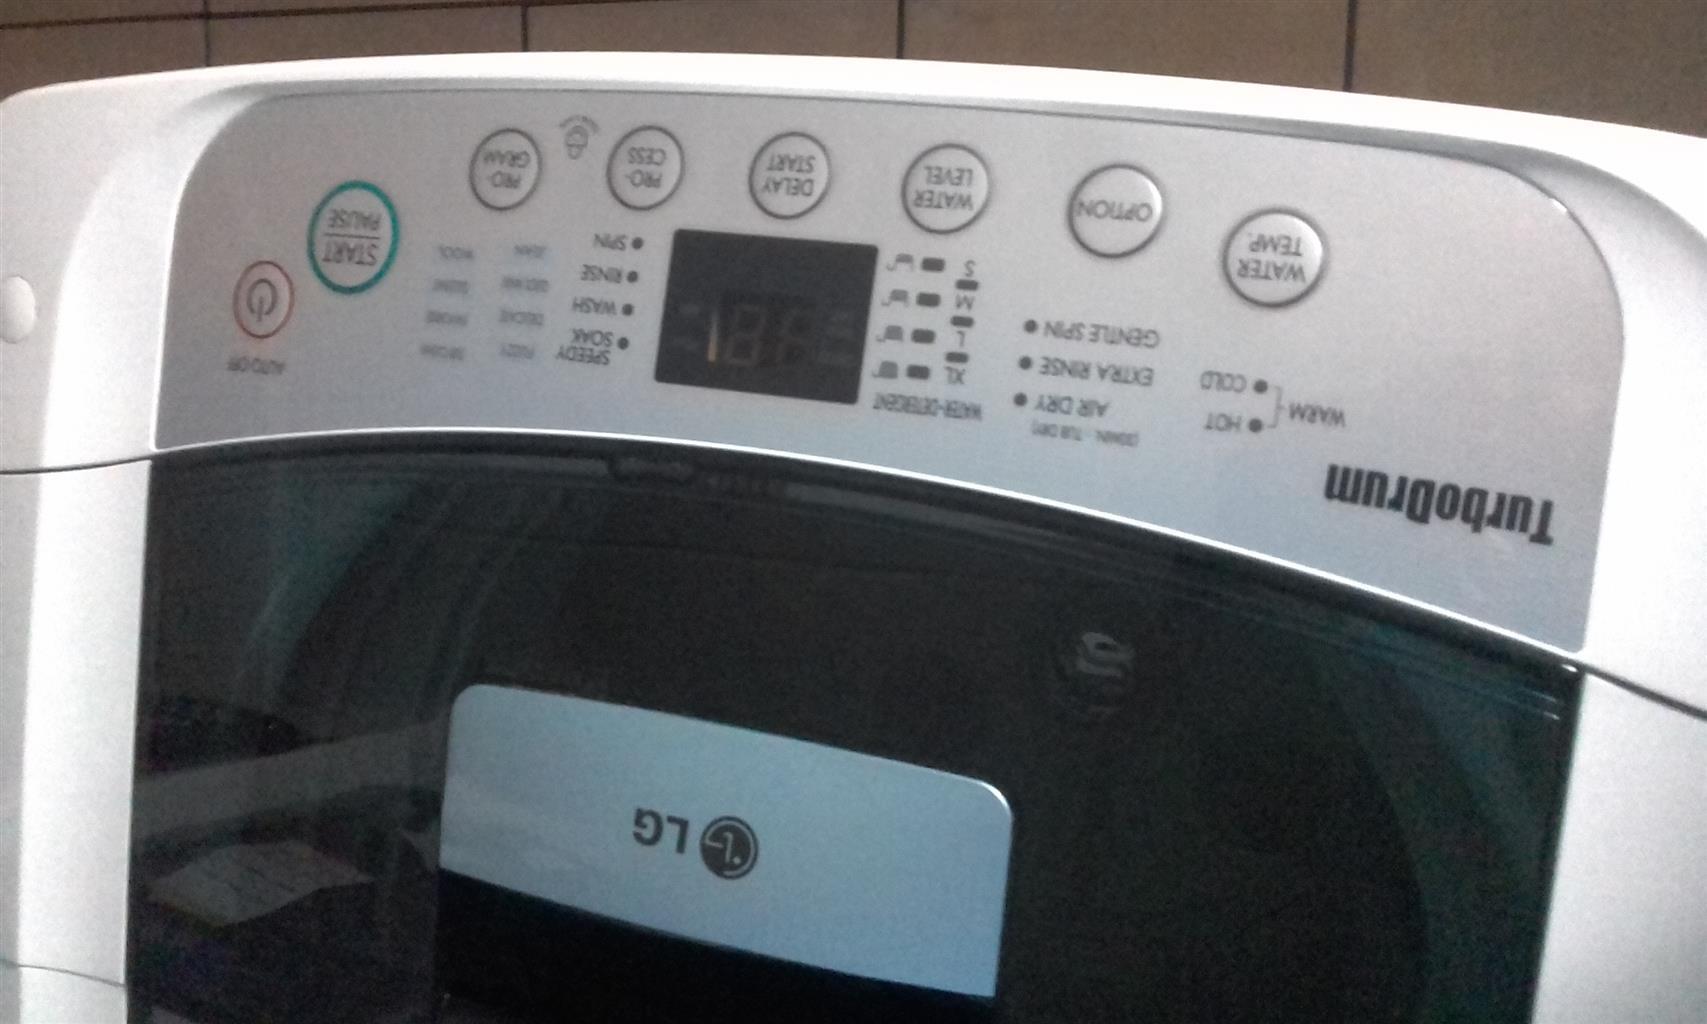 LG fuzzy logic washing machine 8.2kgs